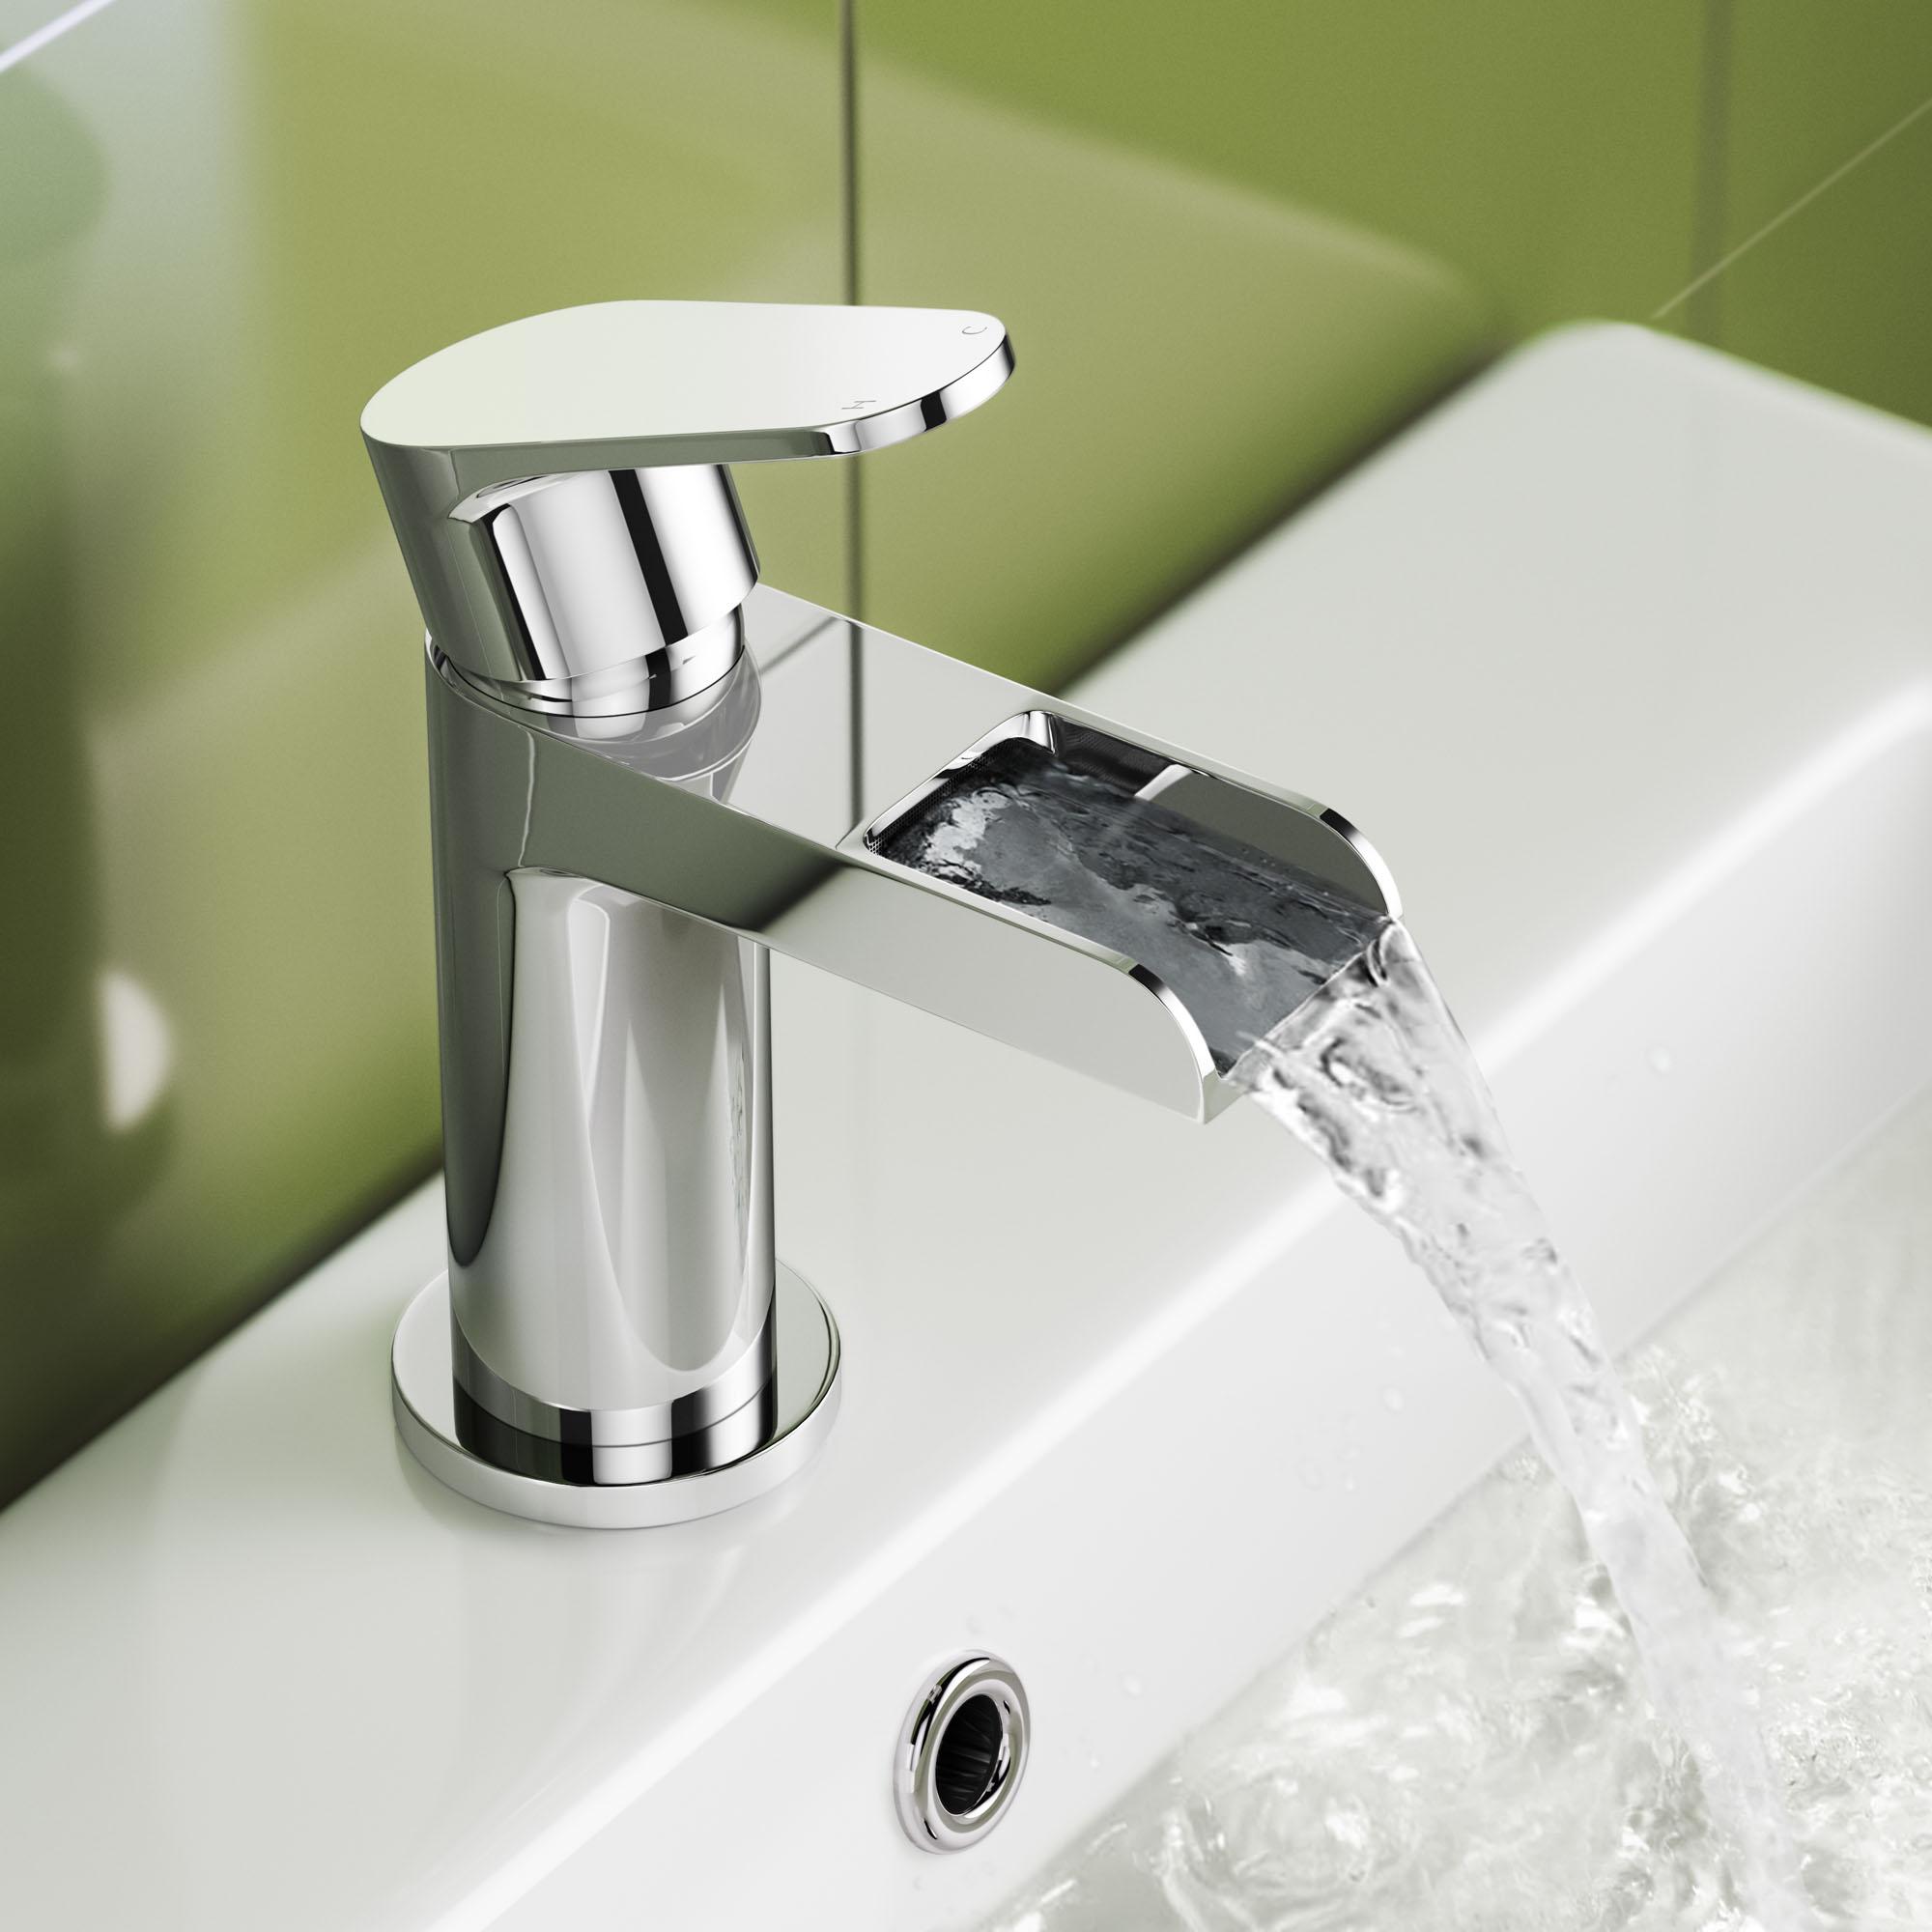 Bathroom fittings get stylish and elegant bathroom fittings - designinyou LPGNLIE